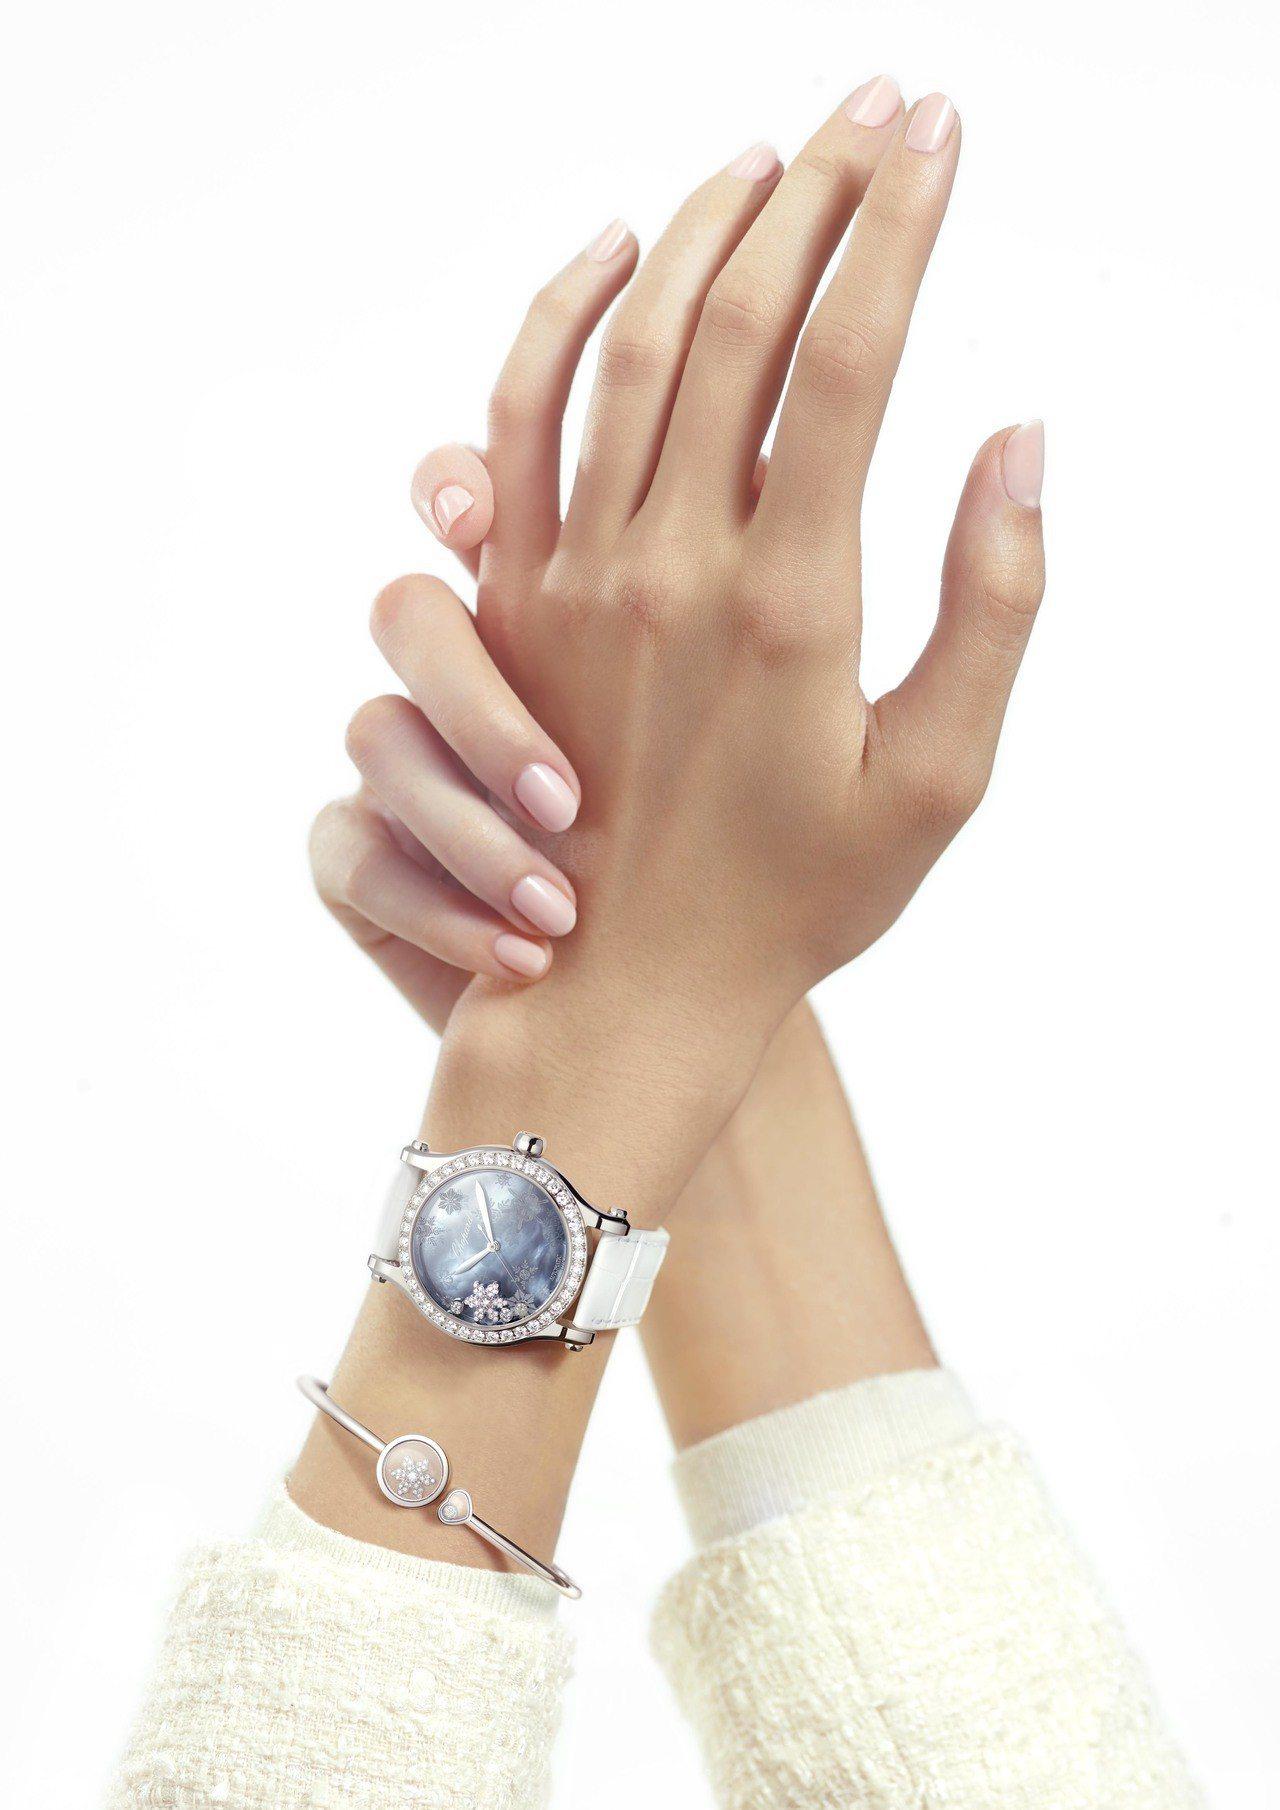 蕭邦Happy Snowflakes自動上鍊腕表,61萬7,000元。蕭邦Hap...